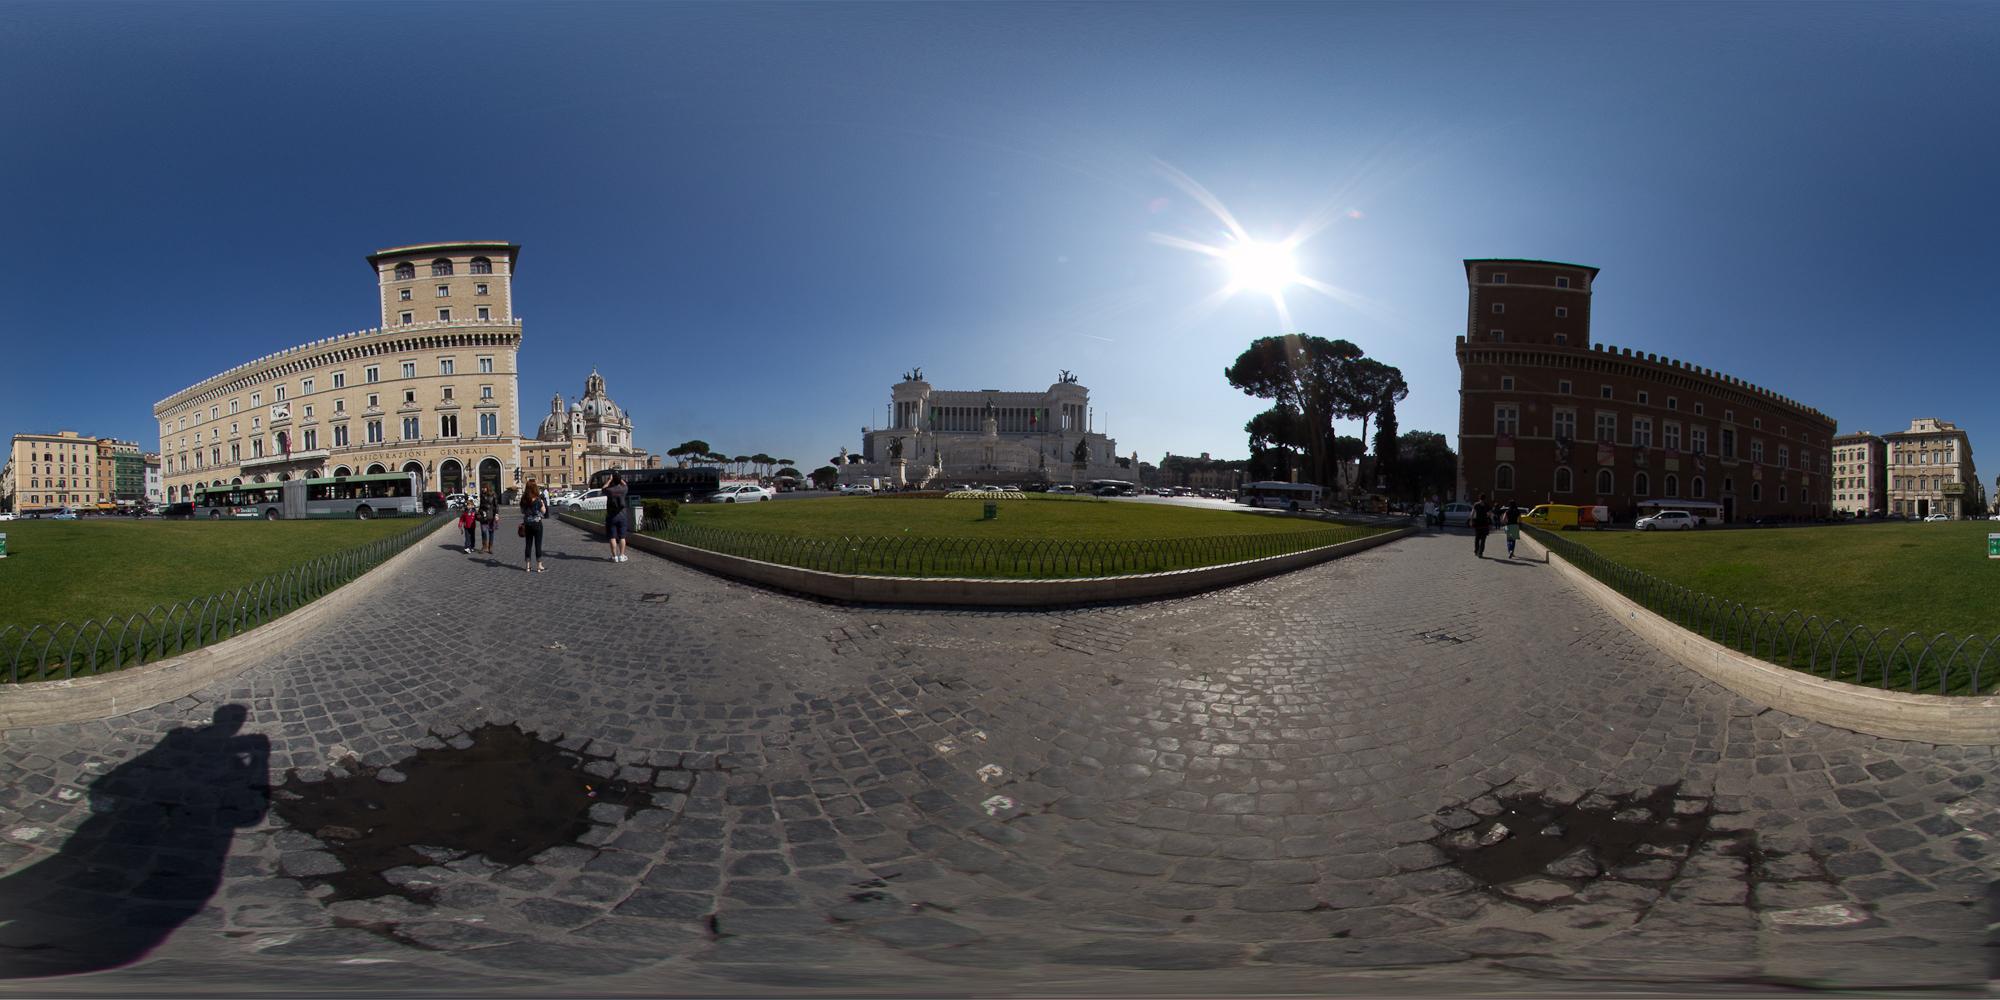 input_images/Piazza Venezia.jpg